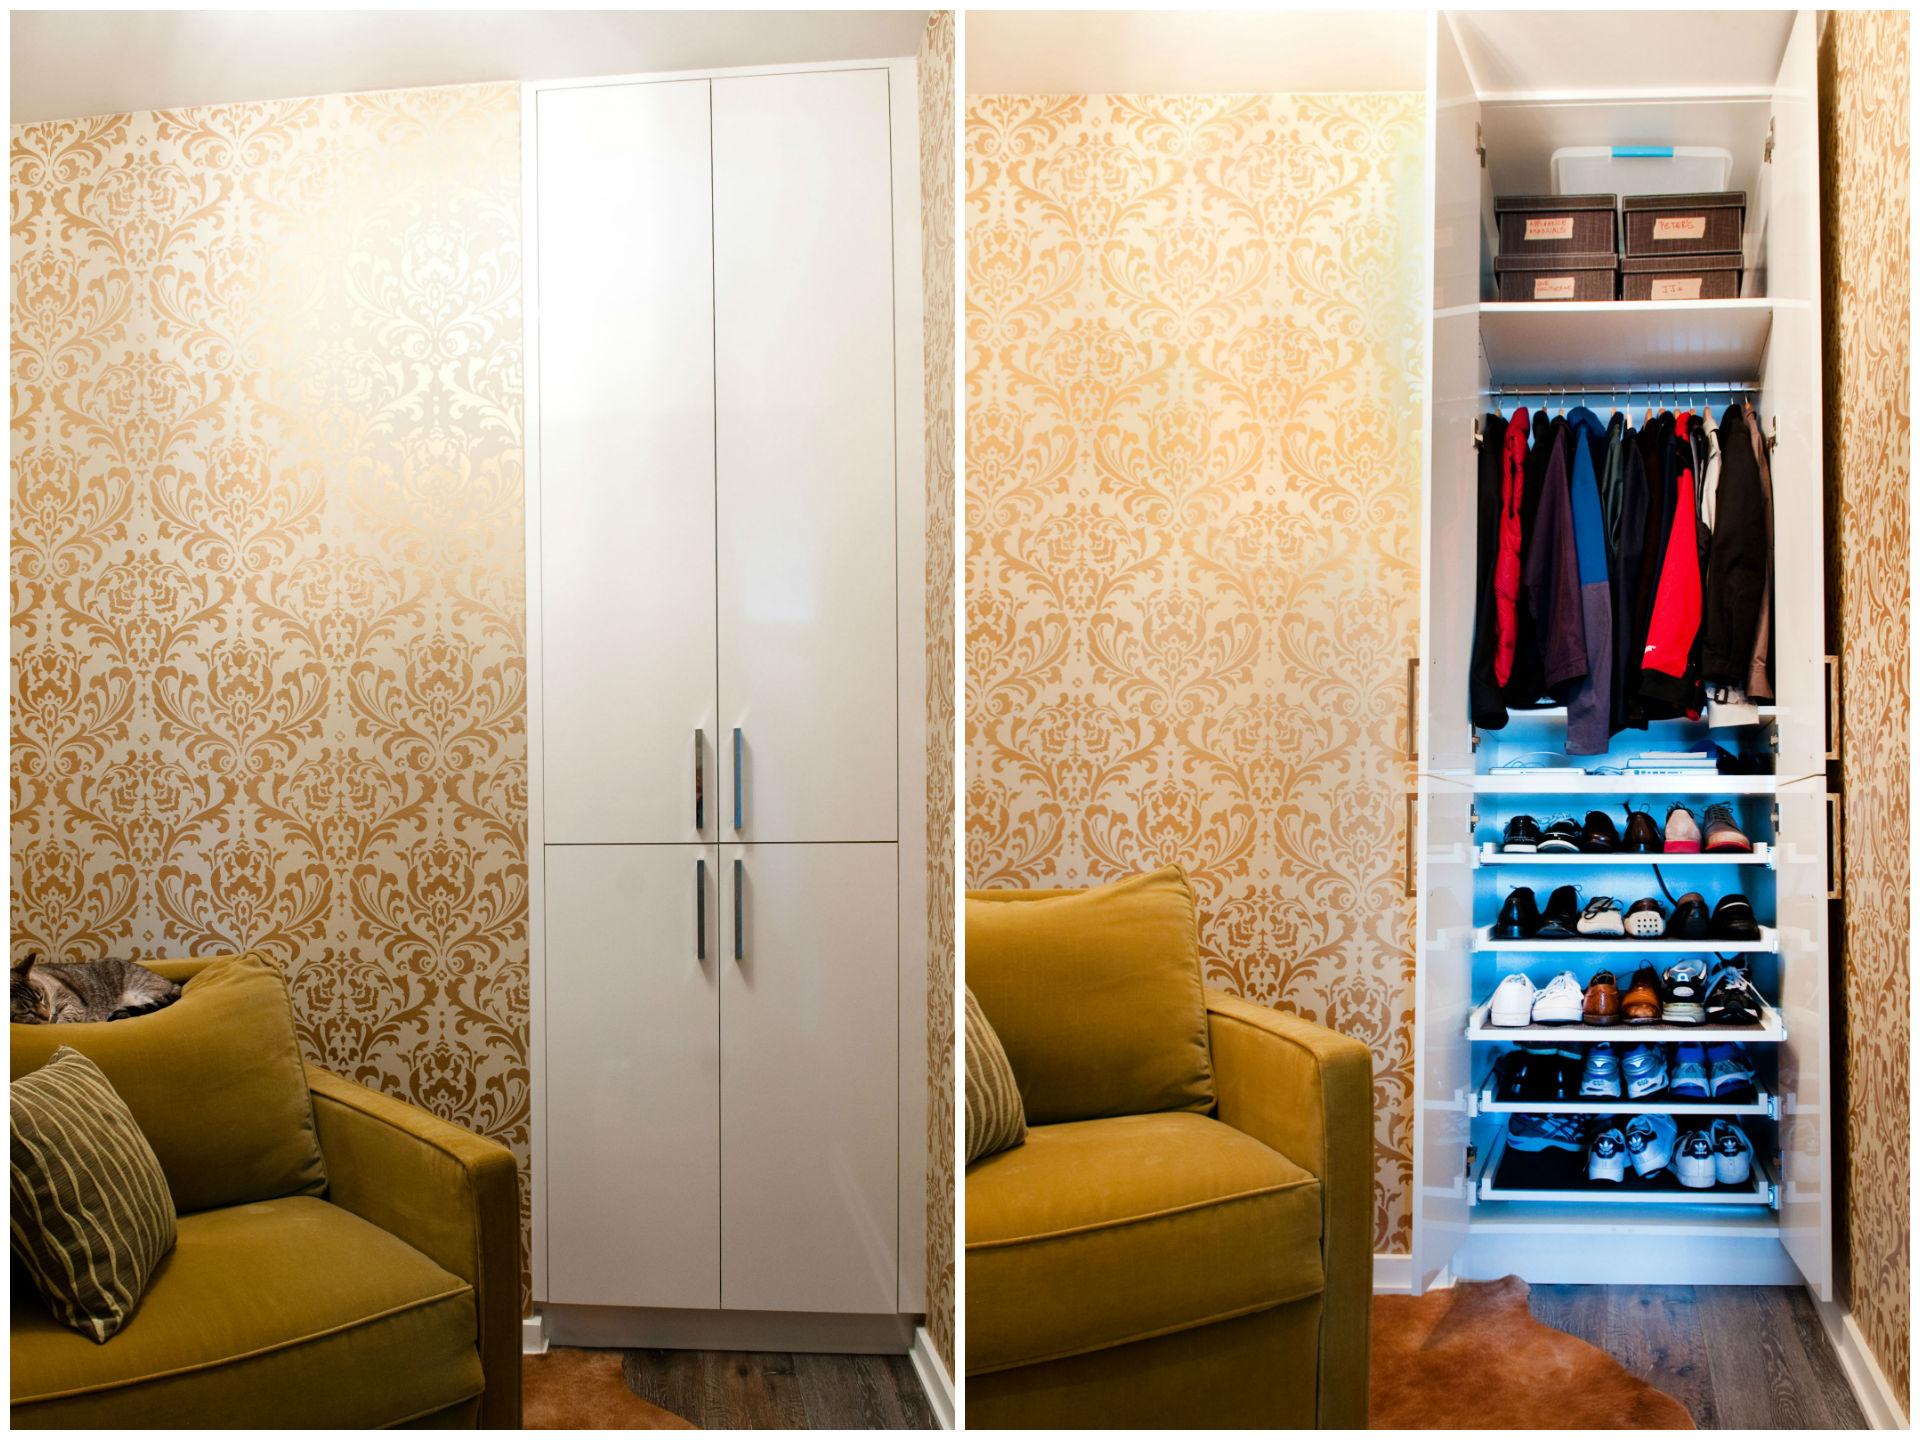 Hawthorne Closet space